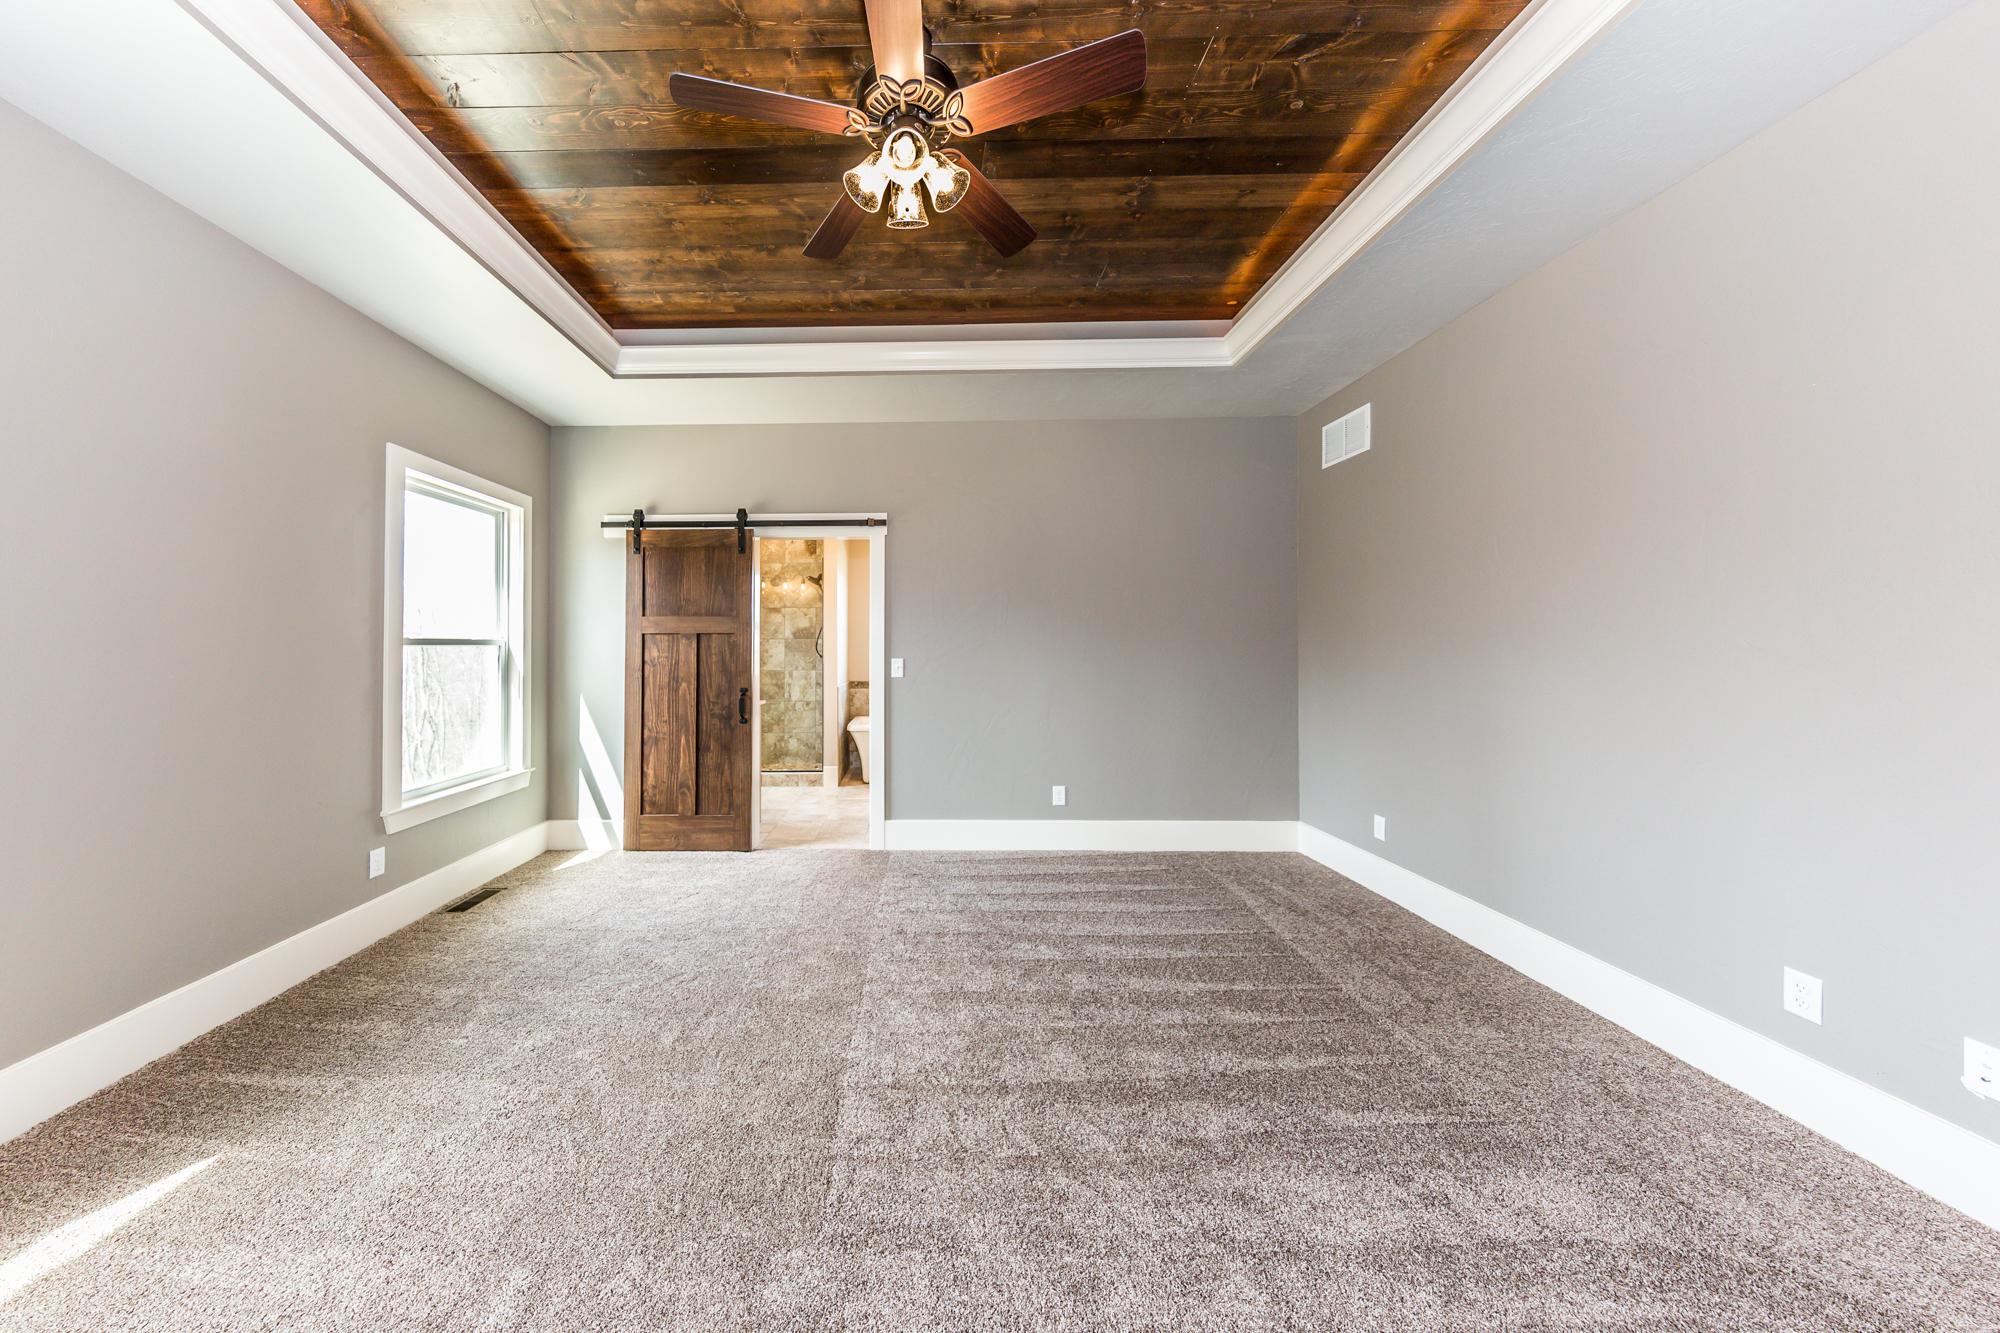 New-Construction-For-Sale-Bethel-Ridge-Farms-Scott-AFB-Illinois-22.jpg